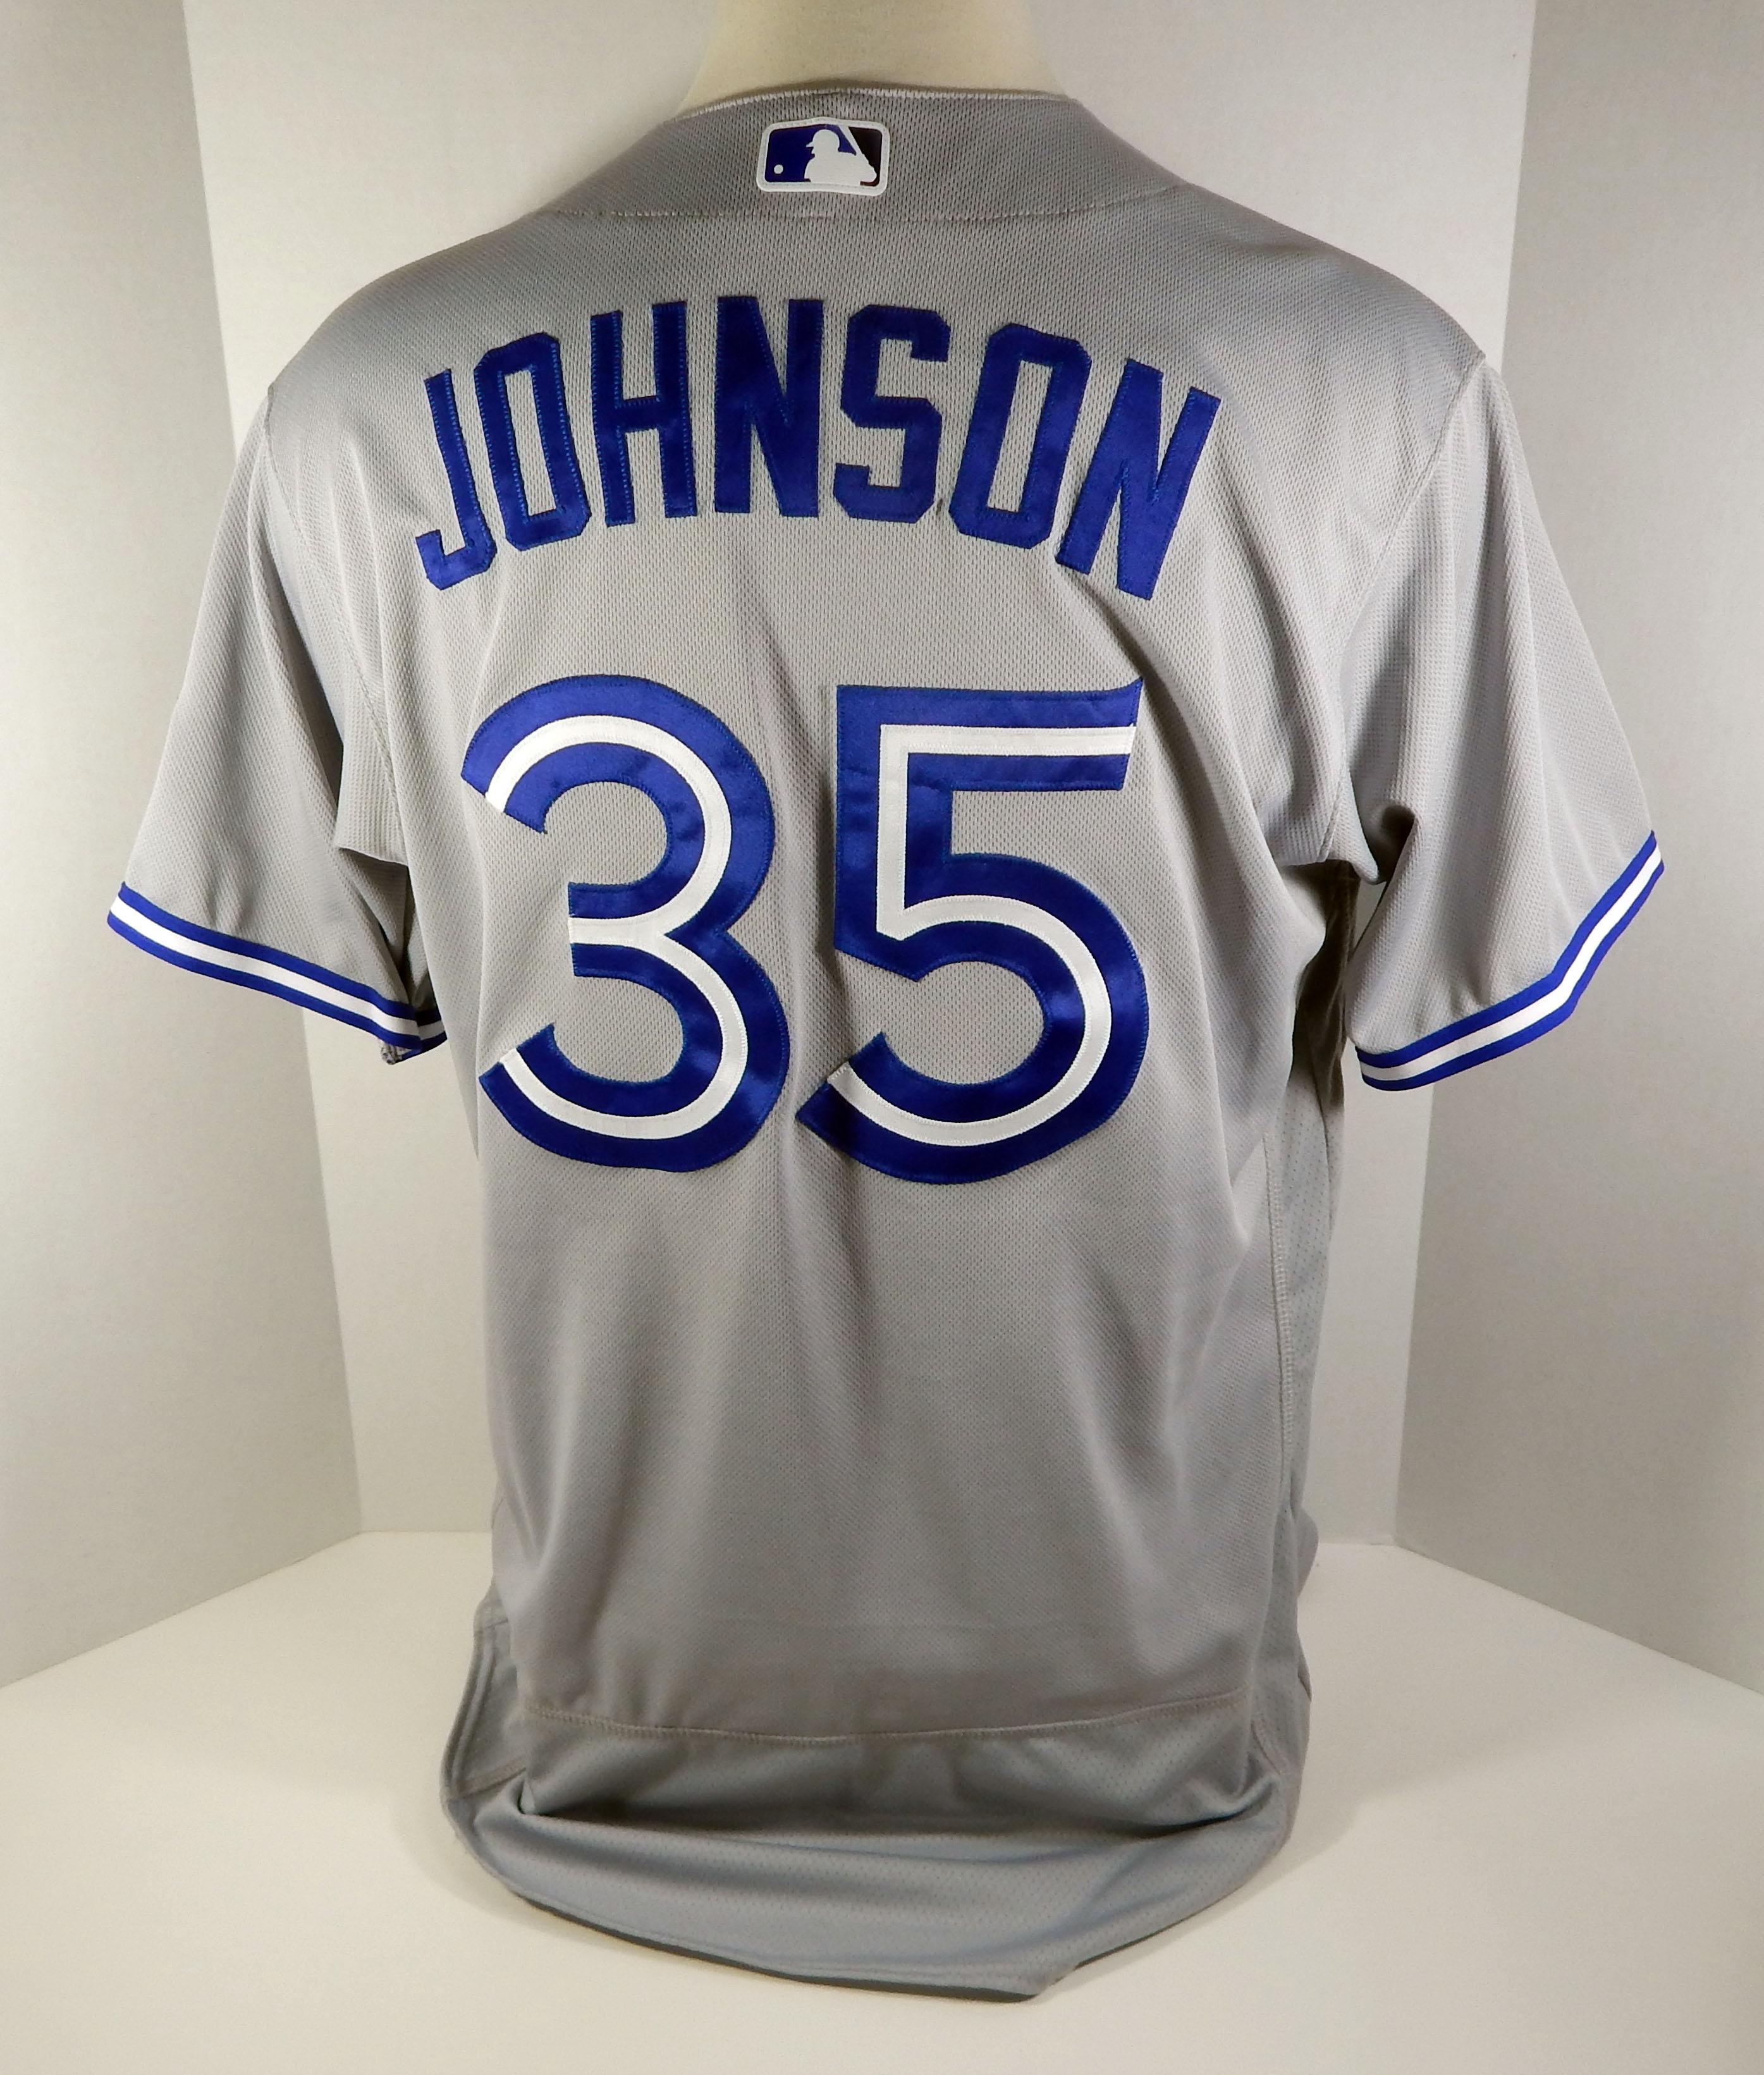 26a6f58a8 2018 Toronto Blue Jays Dane Johnson  35 Game Used Grey Jersey 32 Patch